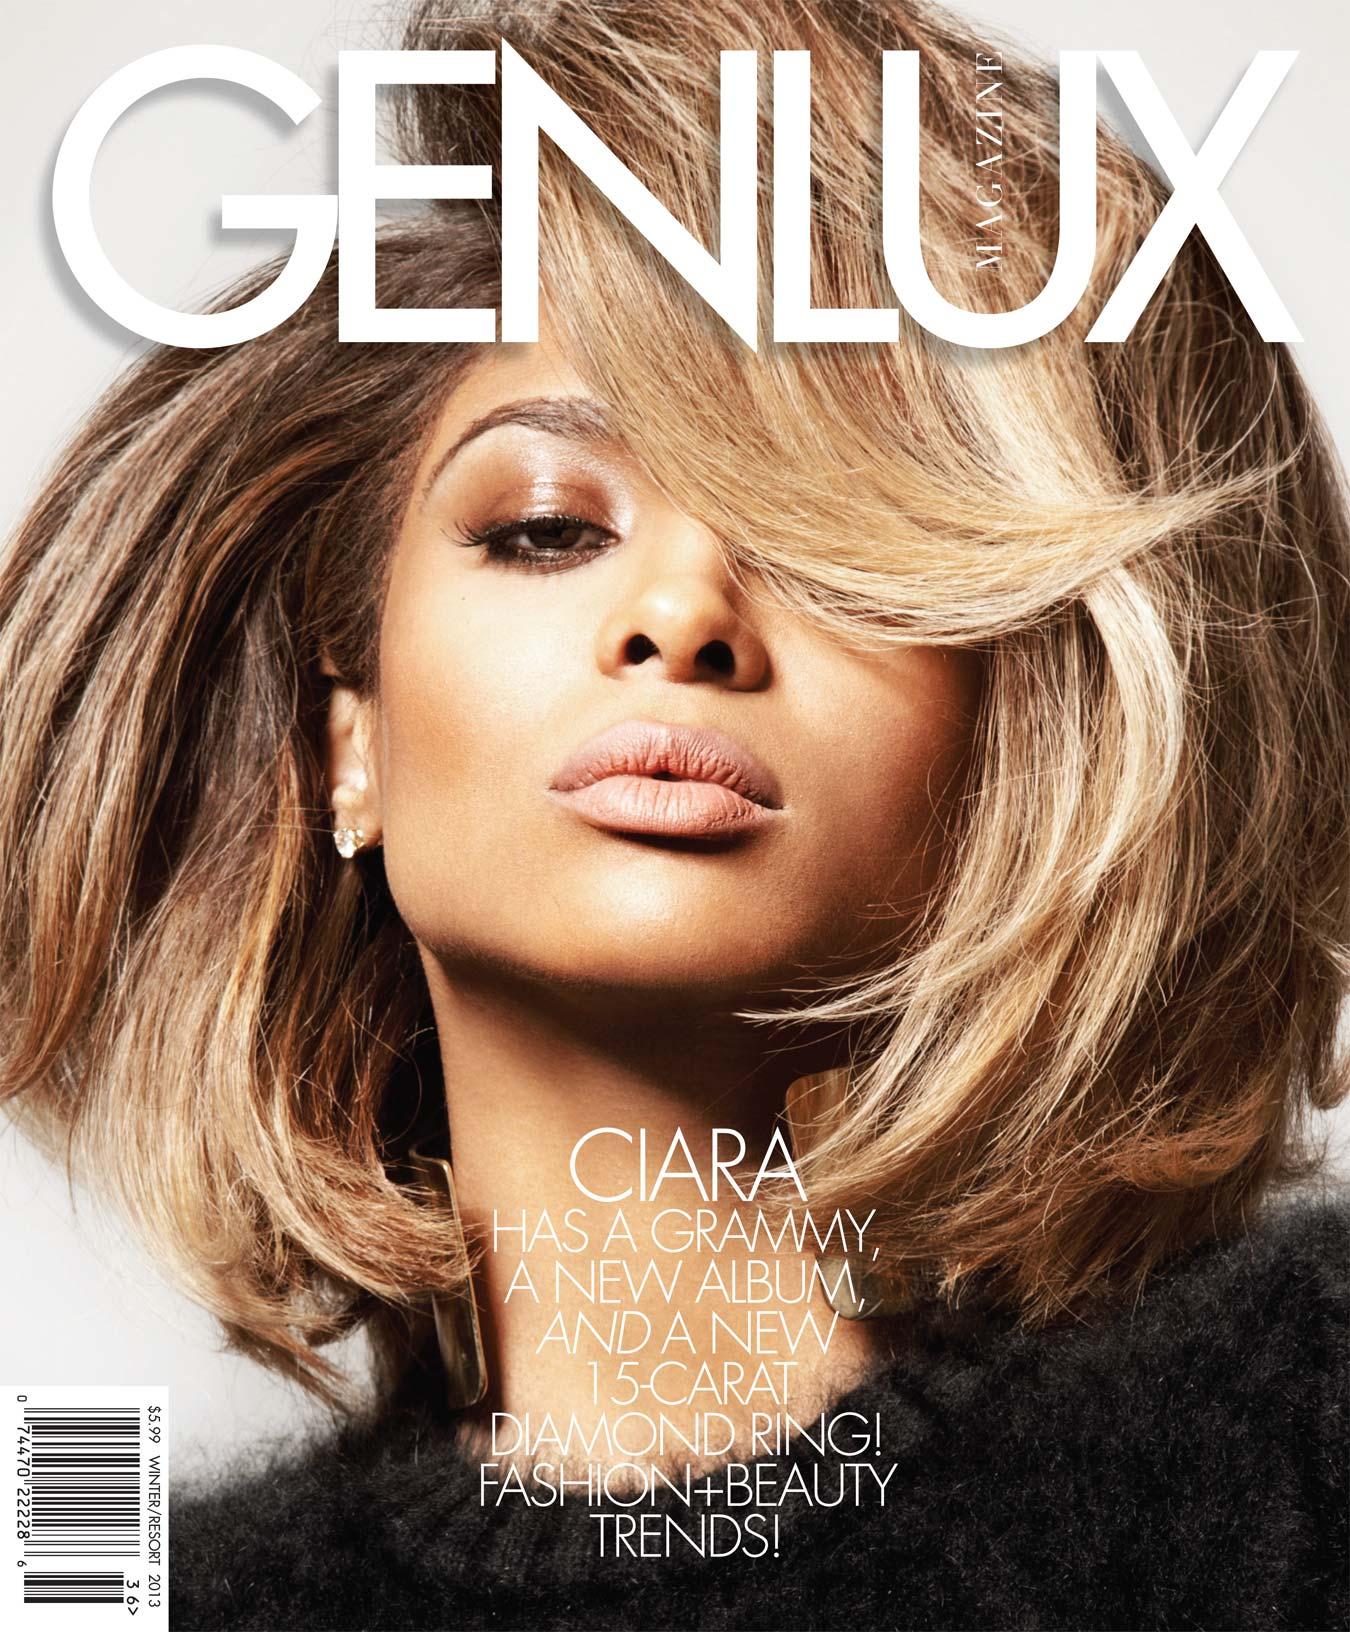 genlux ciara cover - version b